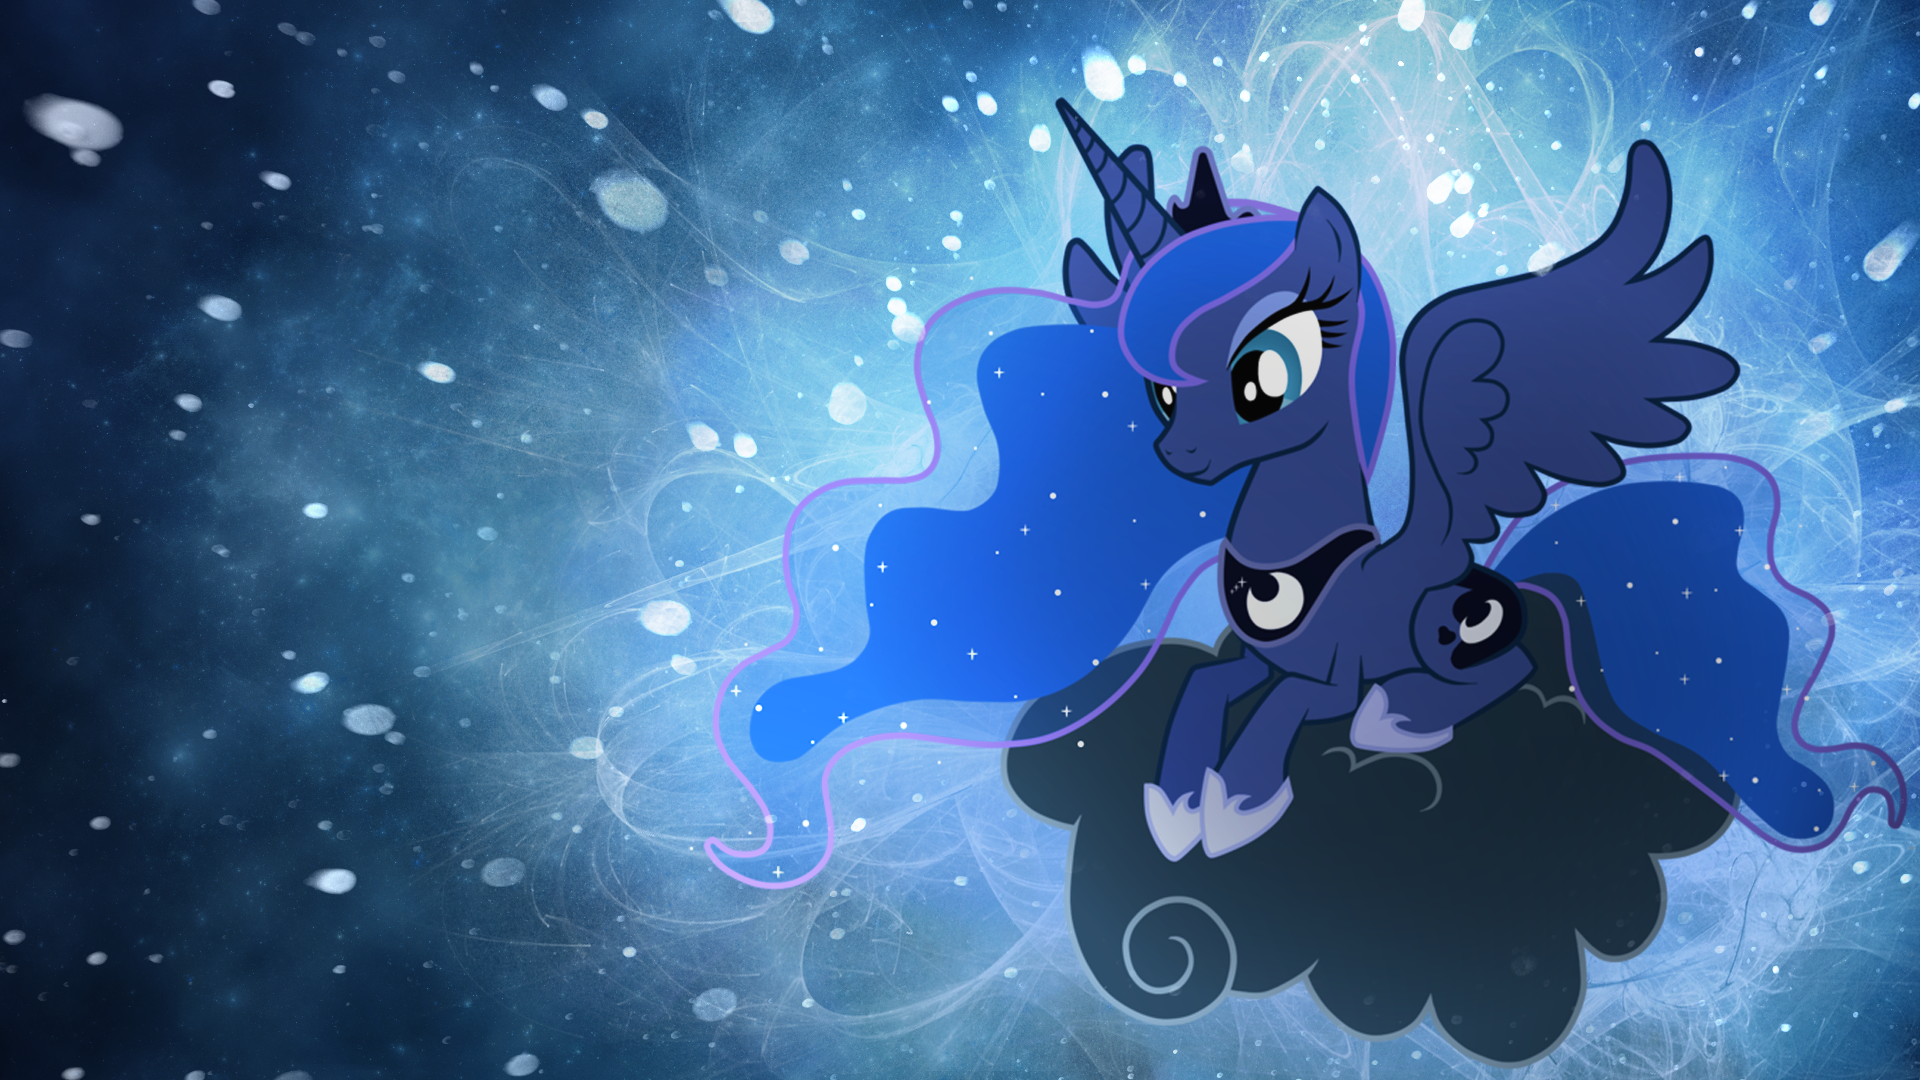 Image  Princess Luna wallpaper by artistovermarepng  My Little